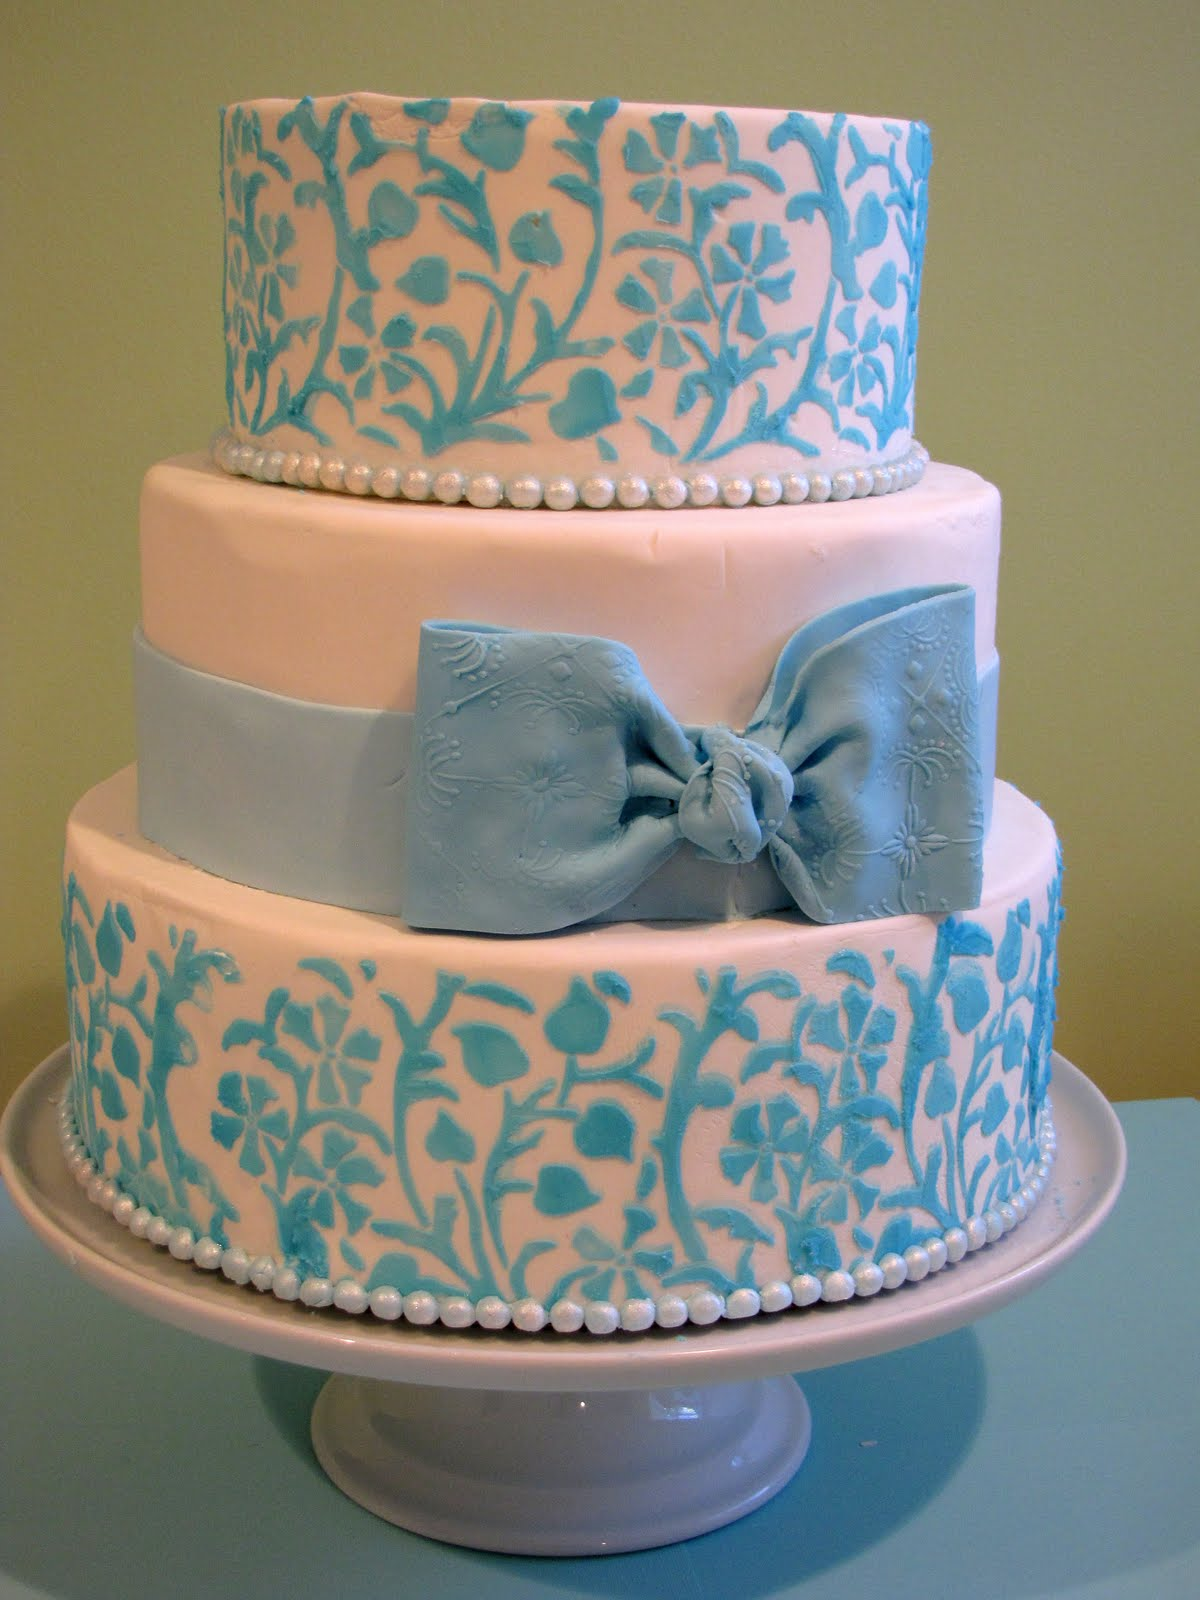 seen this beautiful cake.